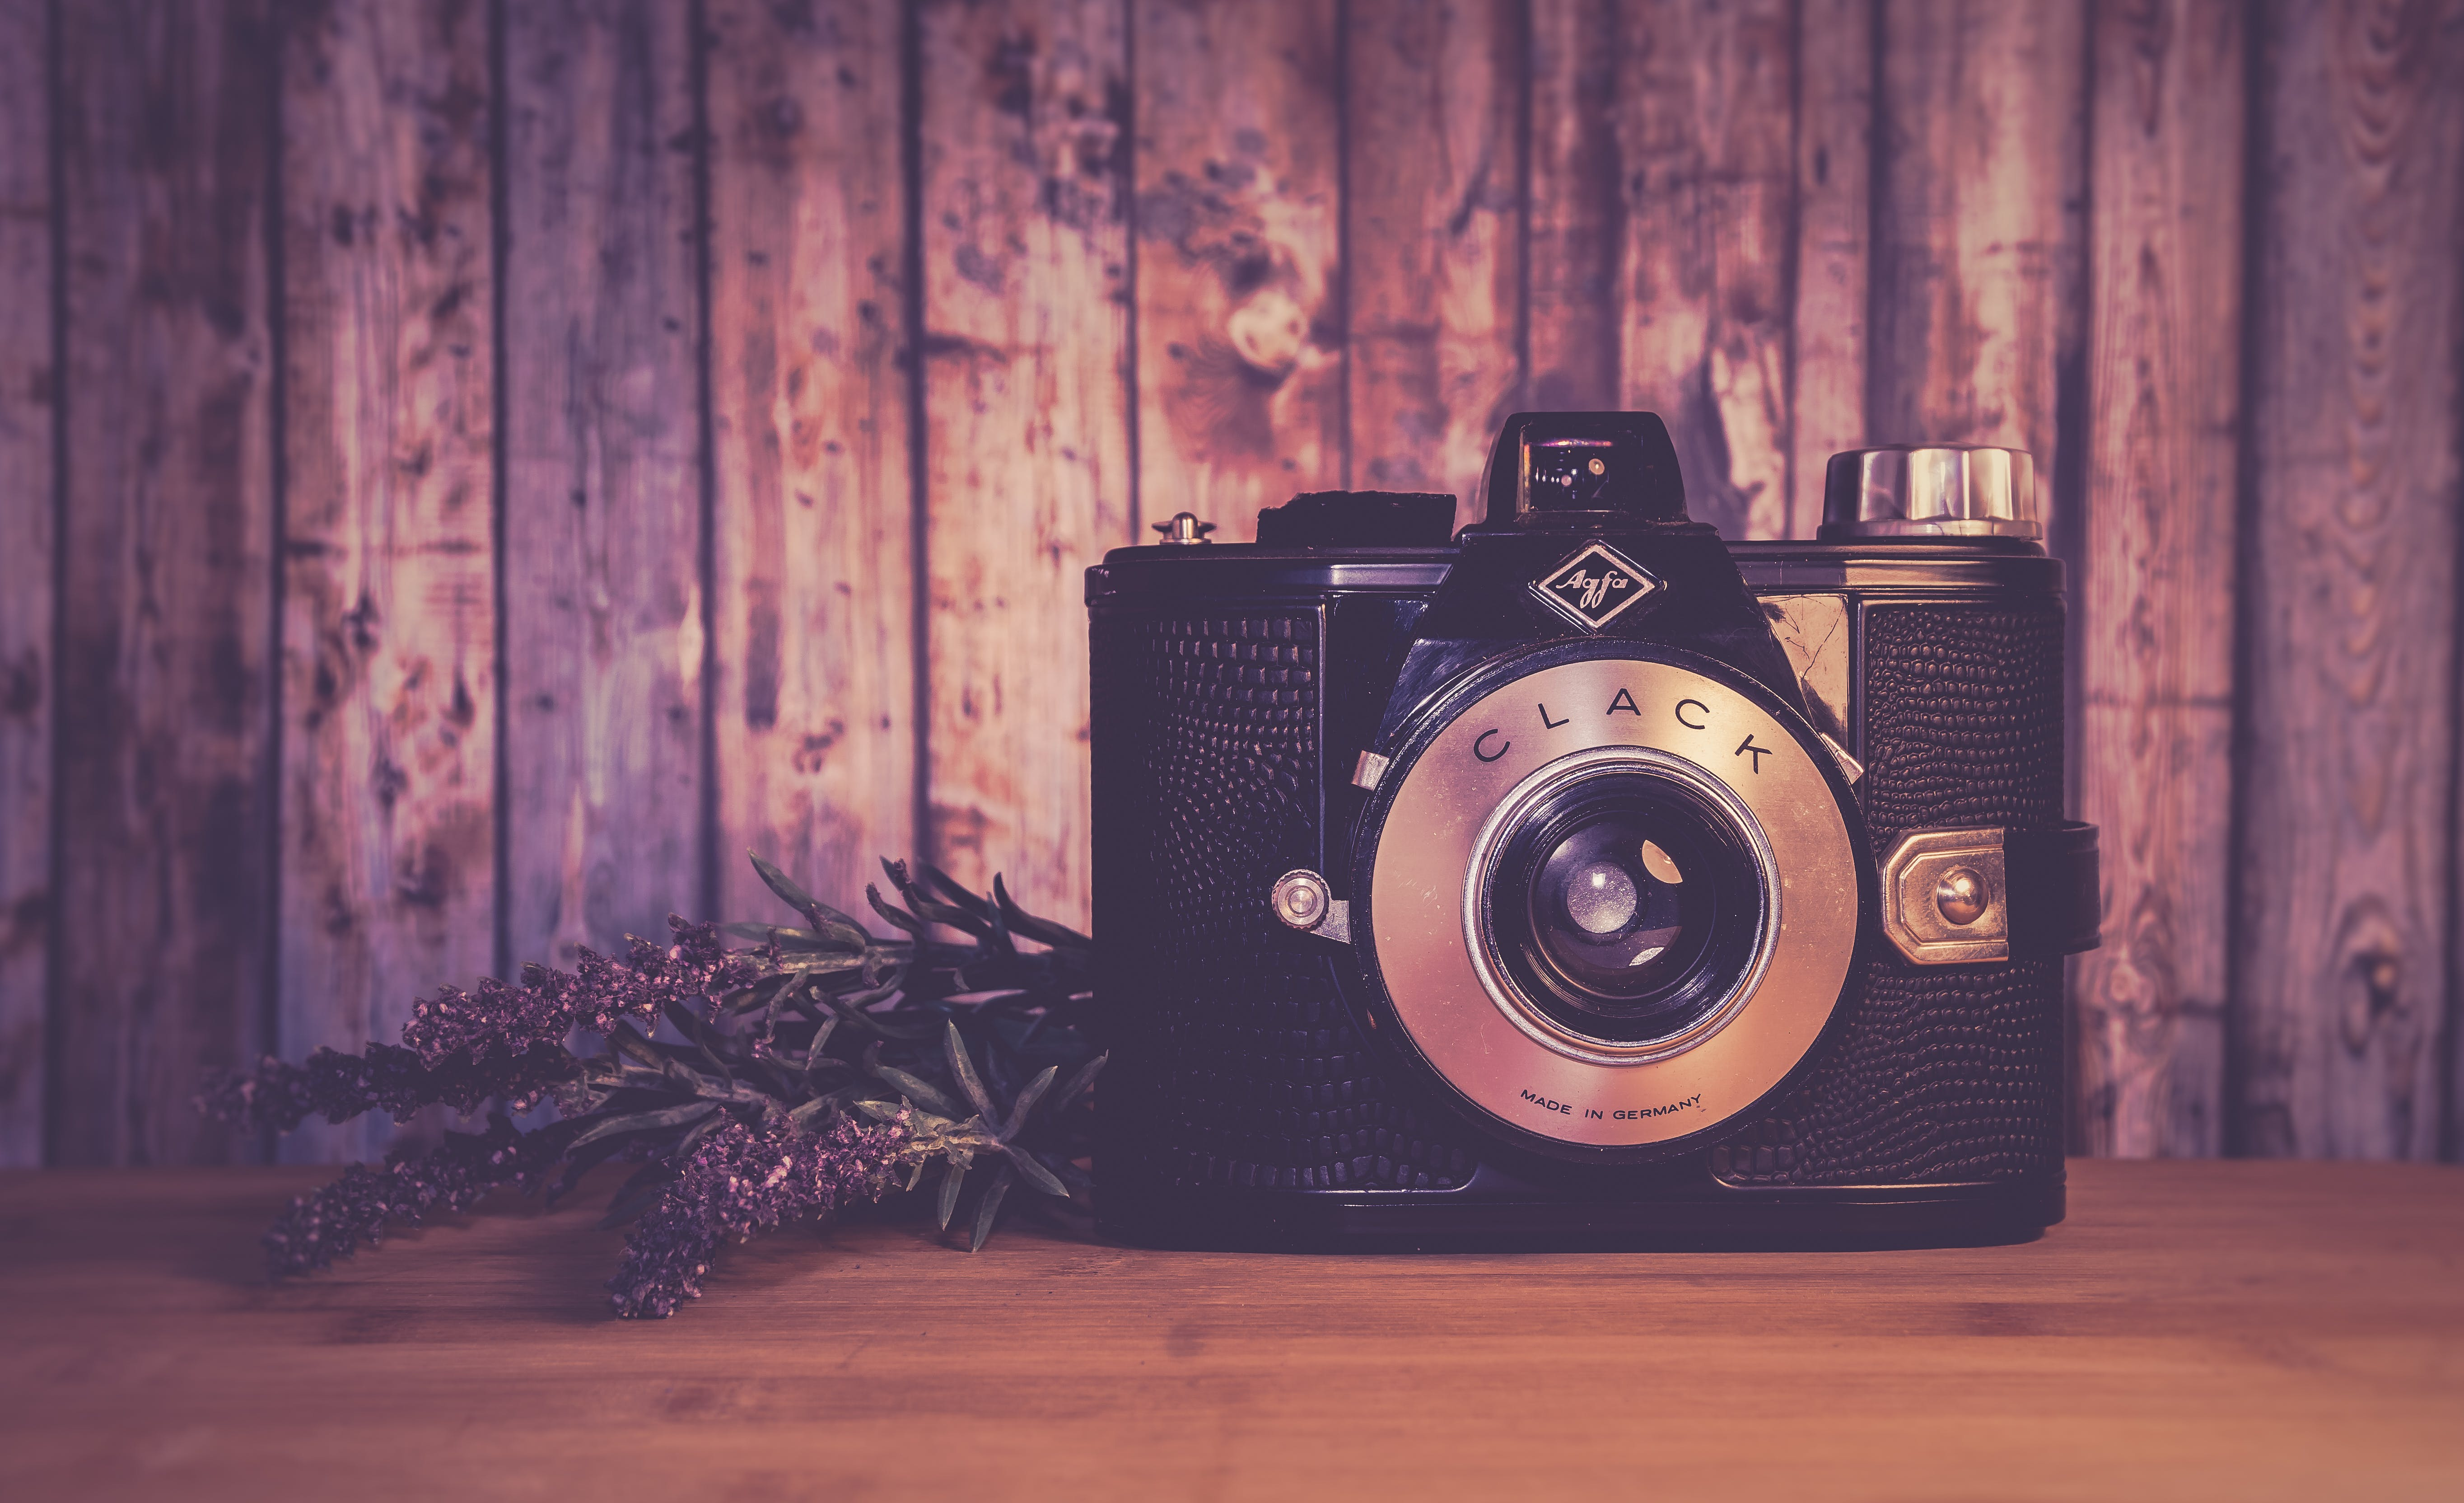 Black Clack Camera